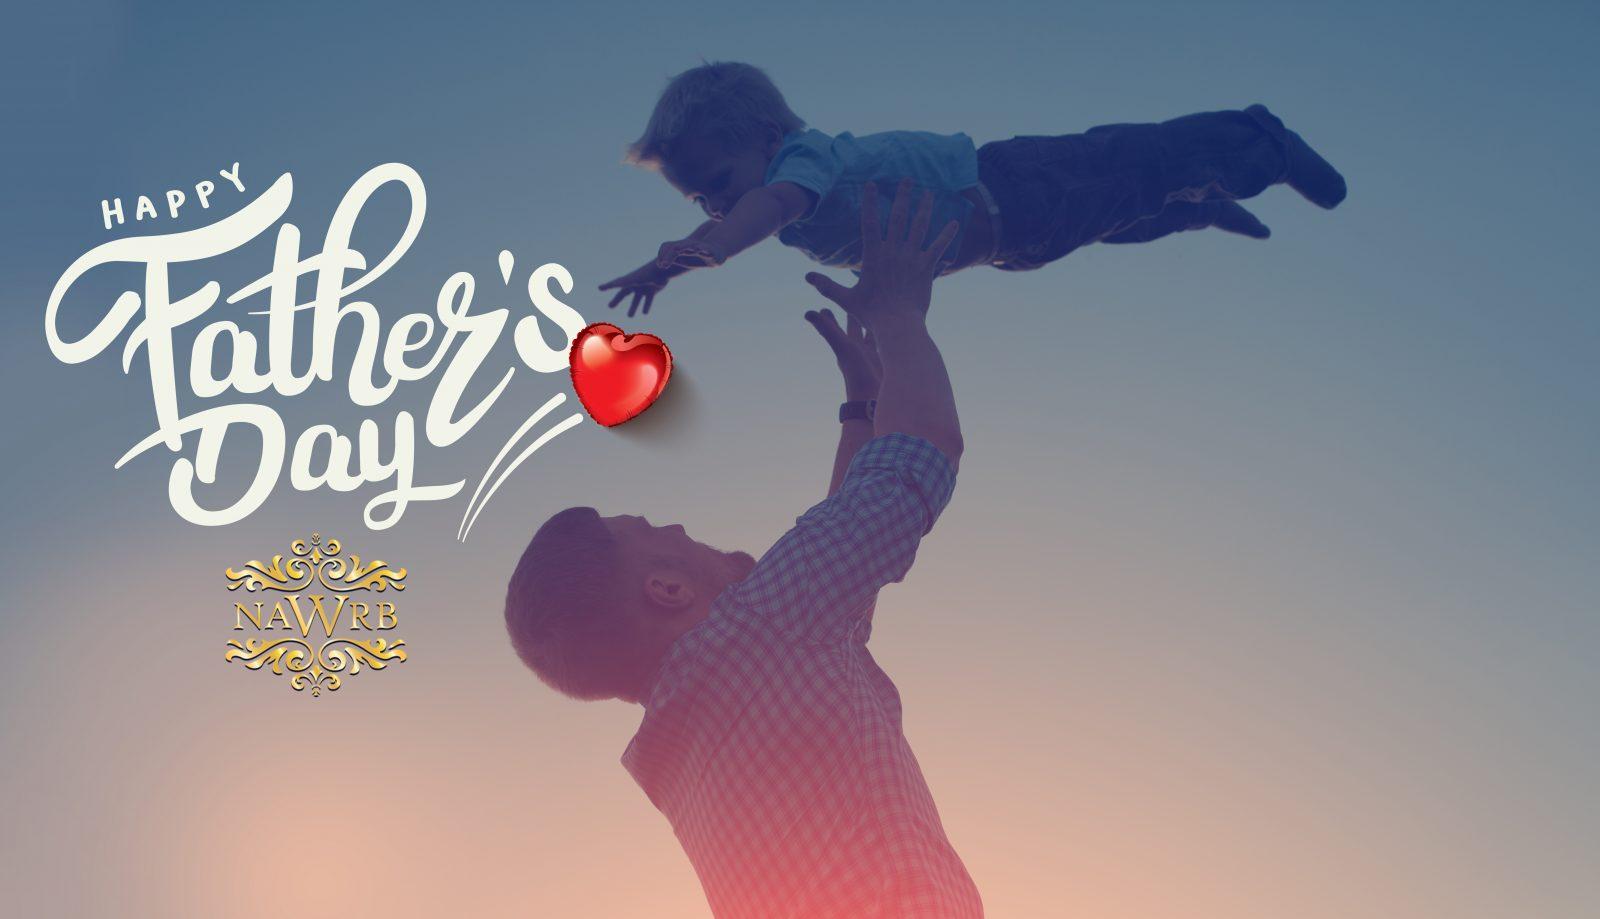 FatherDay-NAWRB